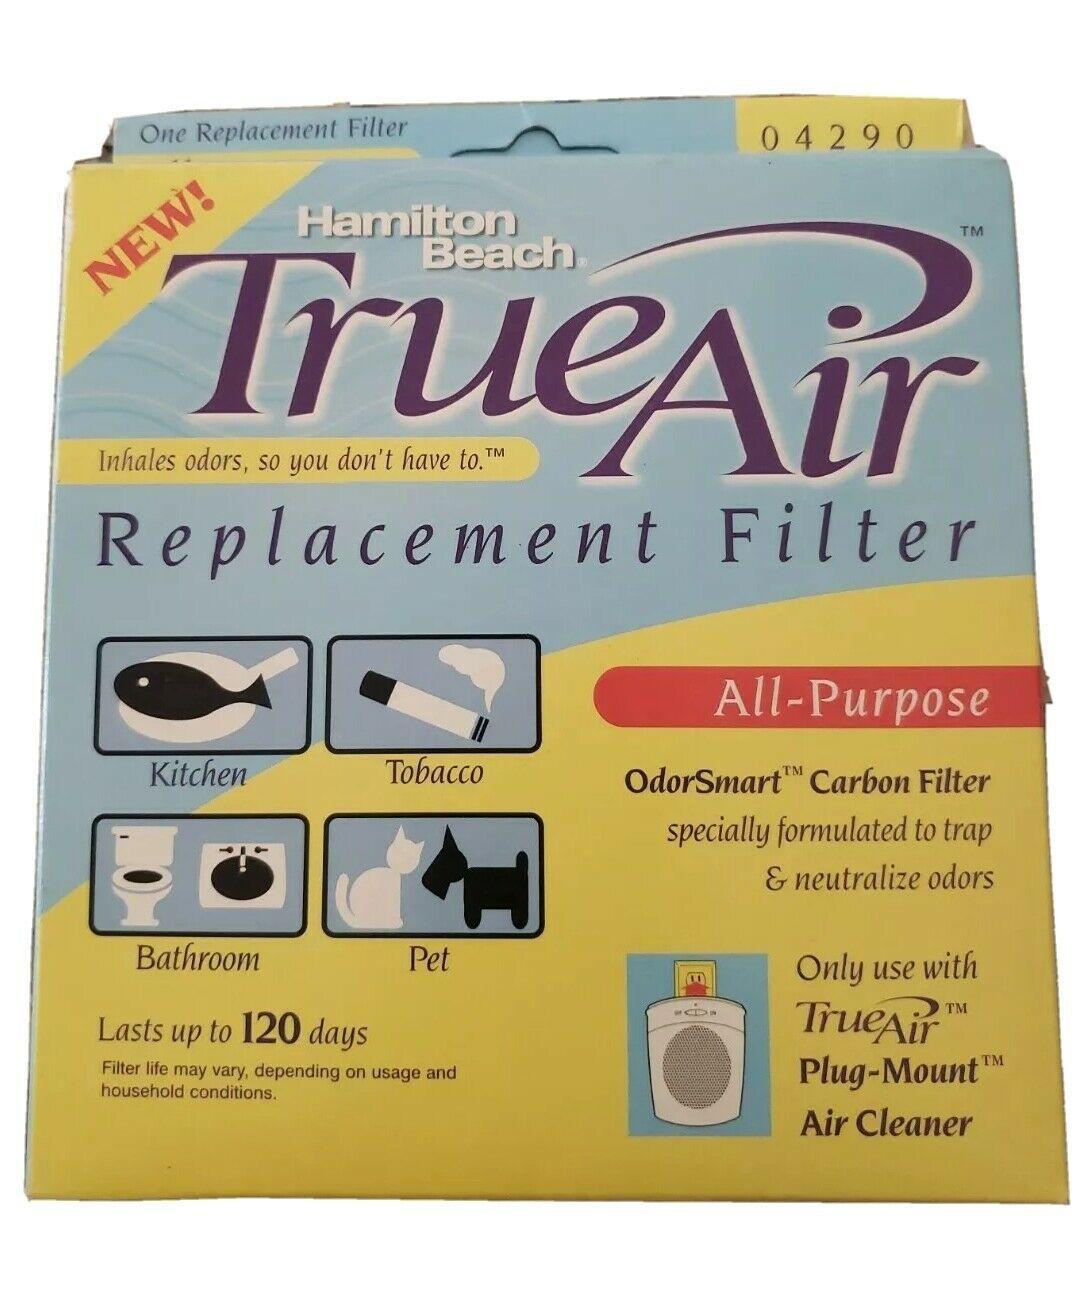 True Air Original Hamilton Beach Carbon Filter 120 days Replacement Filter 04290 - $11.87